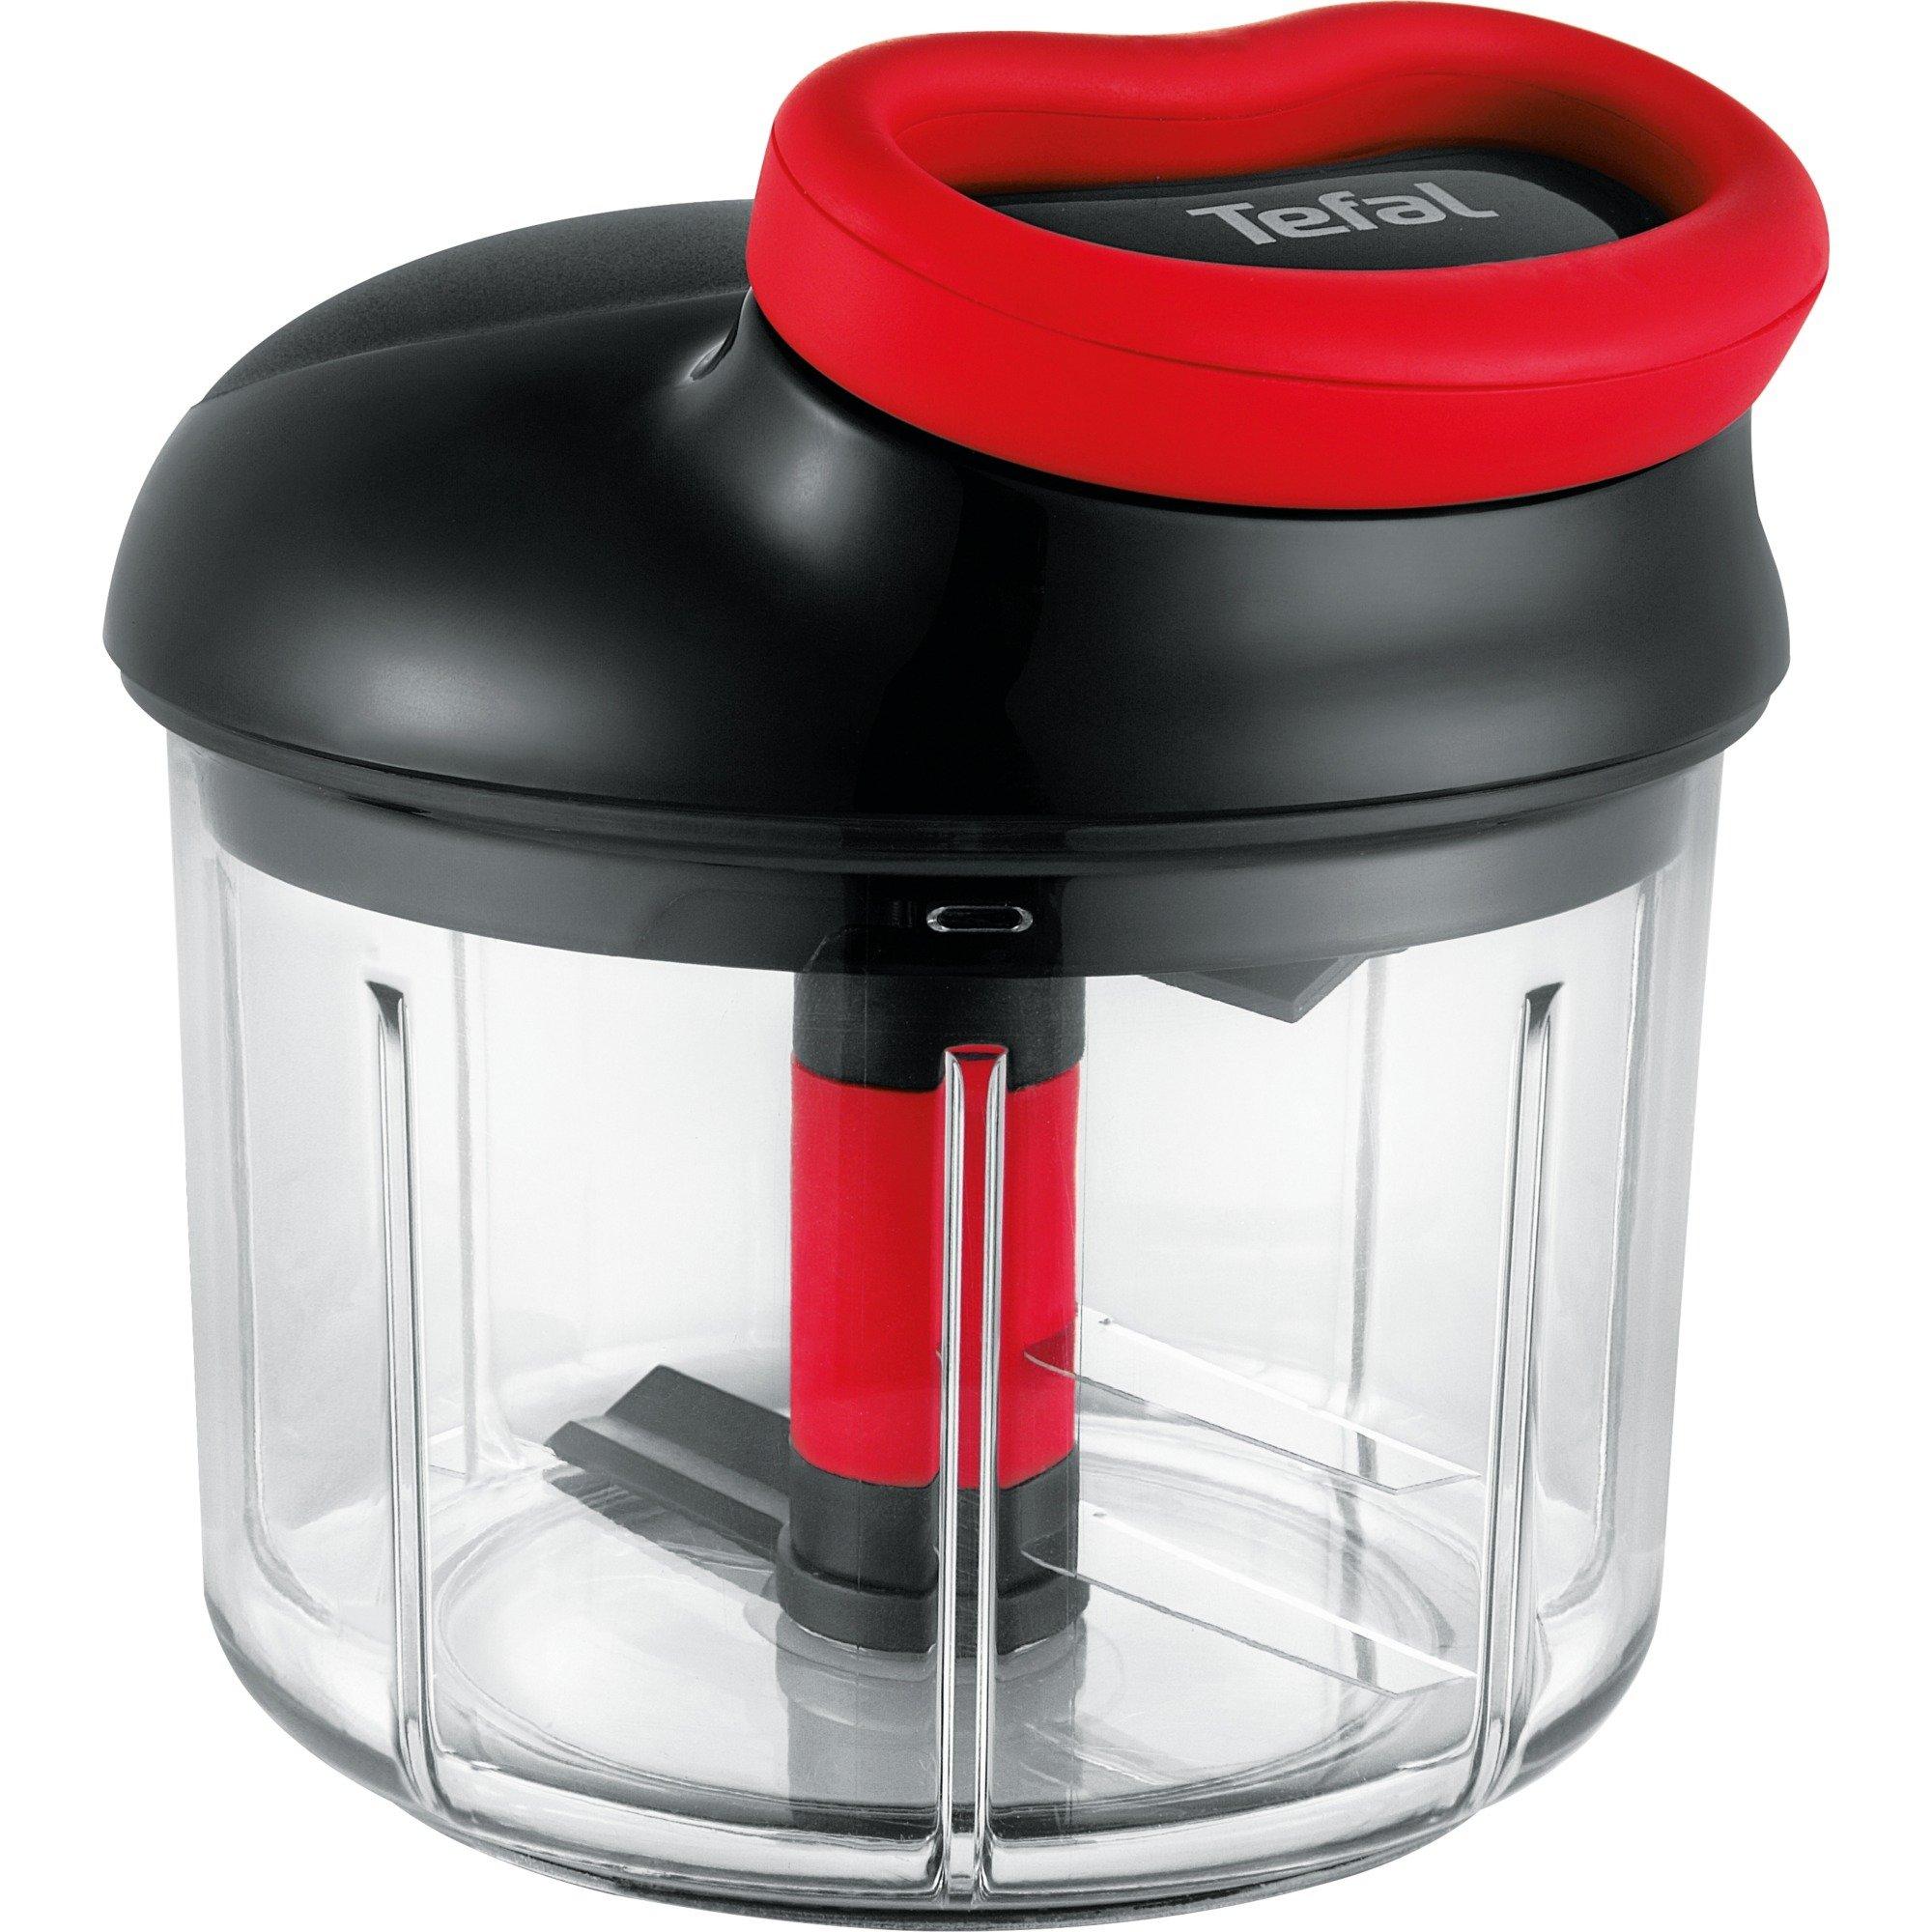 K09811 Negro, Transparente picadora manual de alimentos, Trituradora